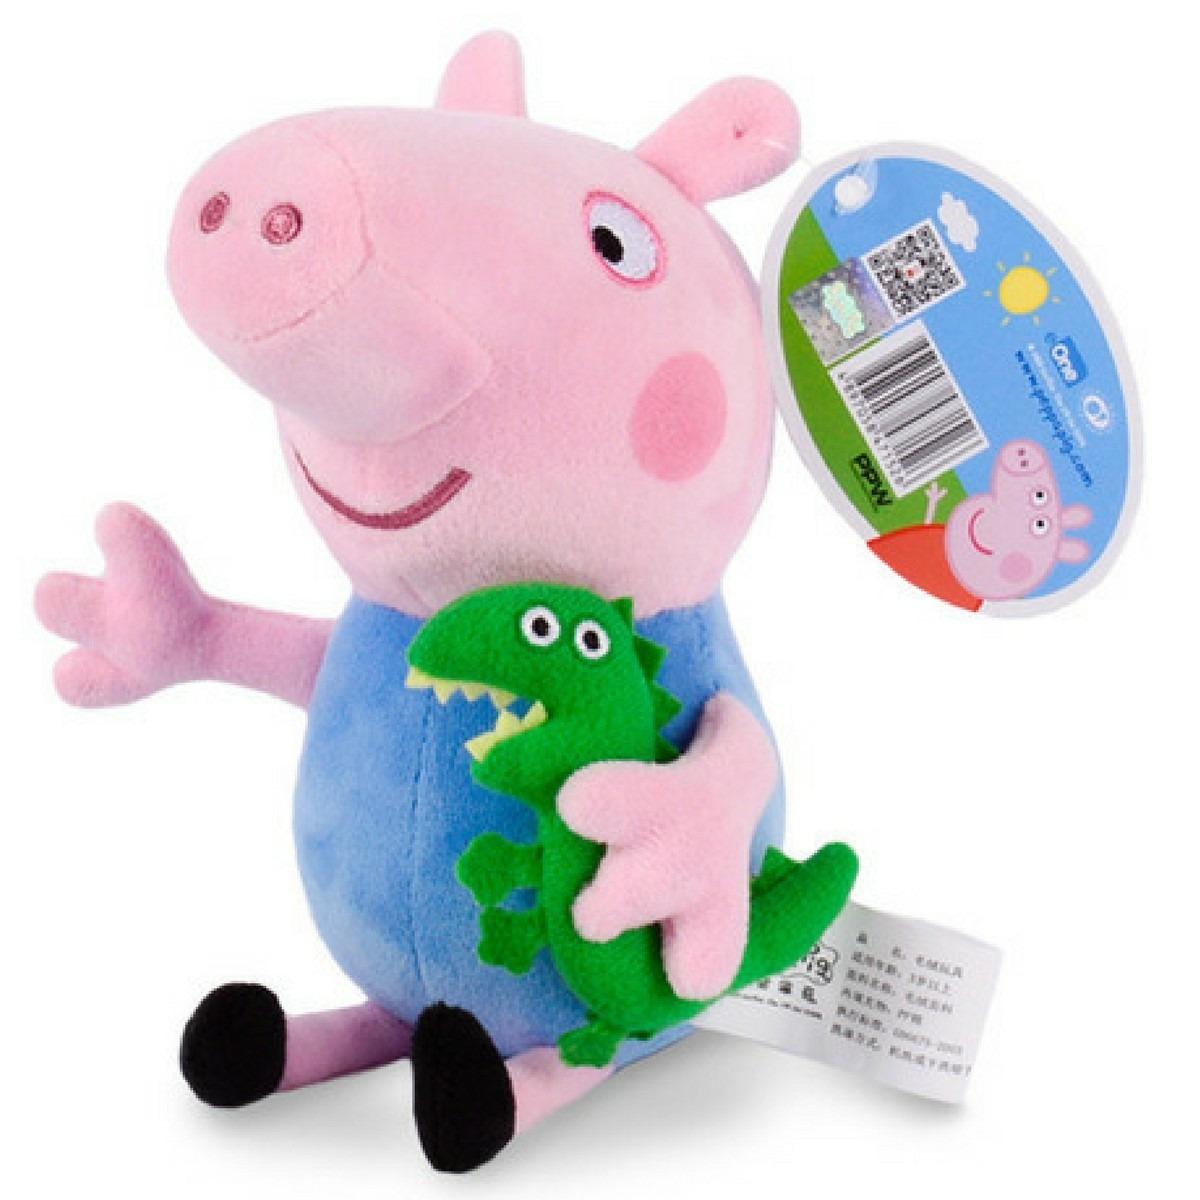 kit dvd peppa pig + dinossauro george + peppa pig pelúcia